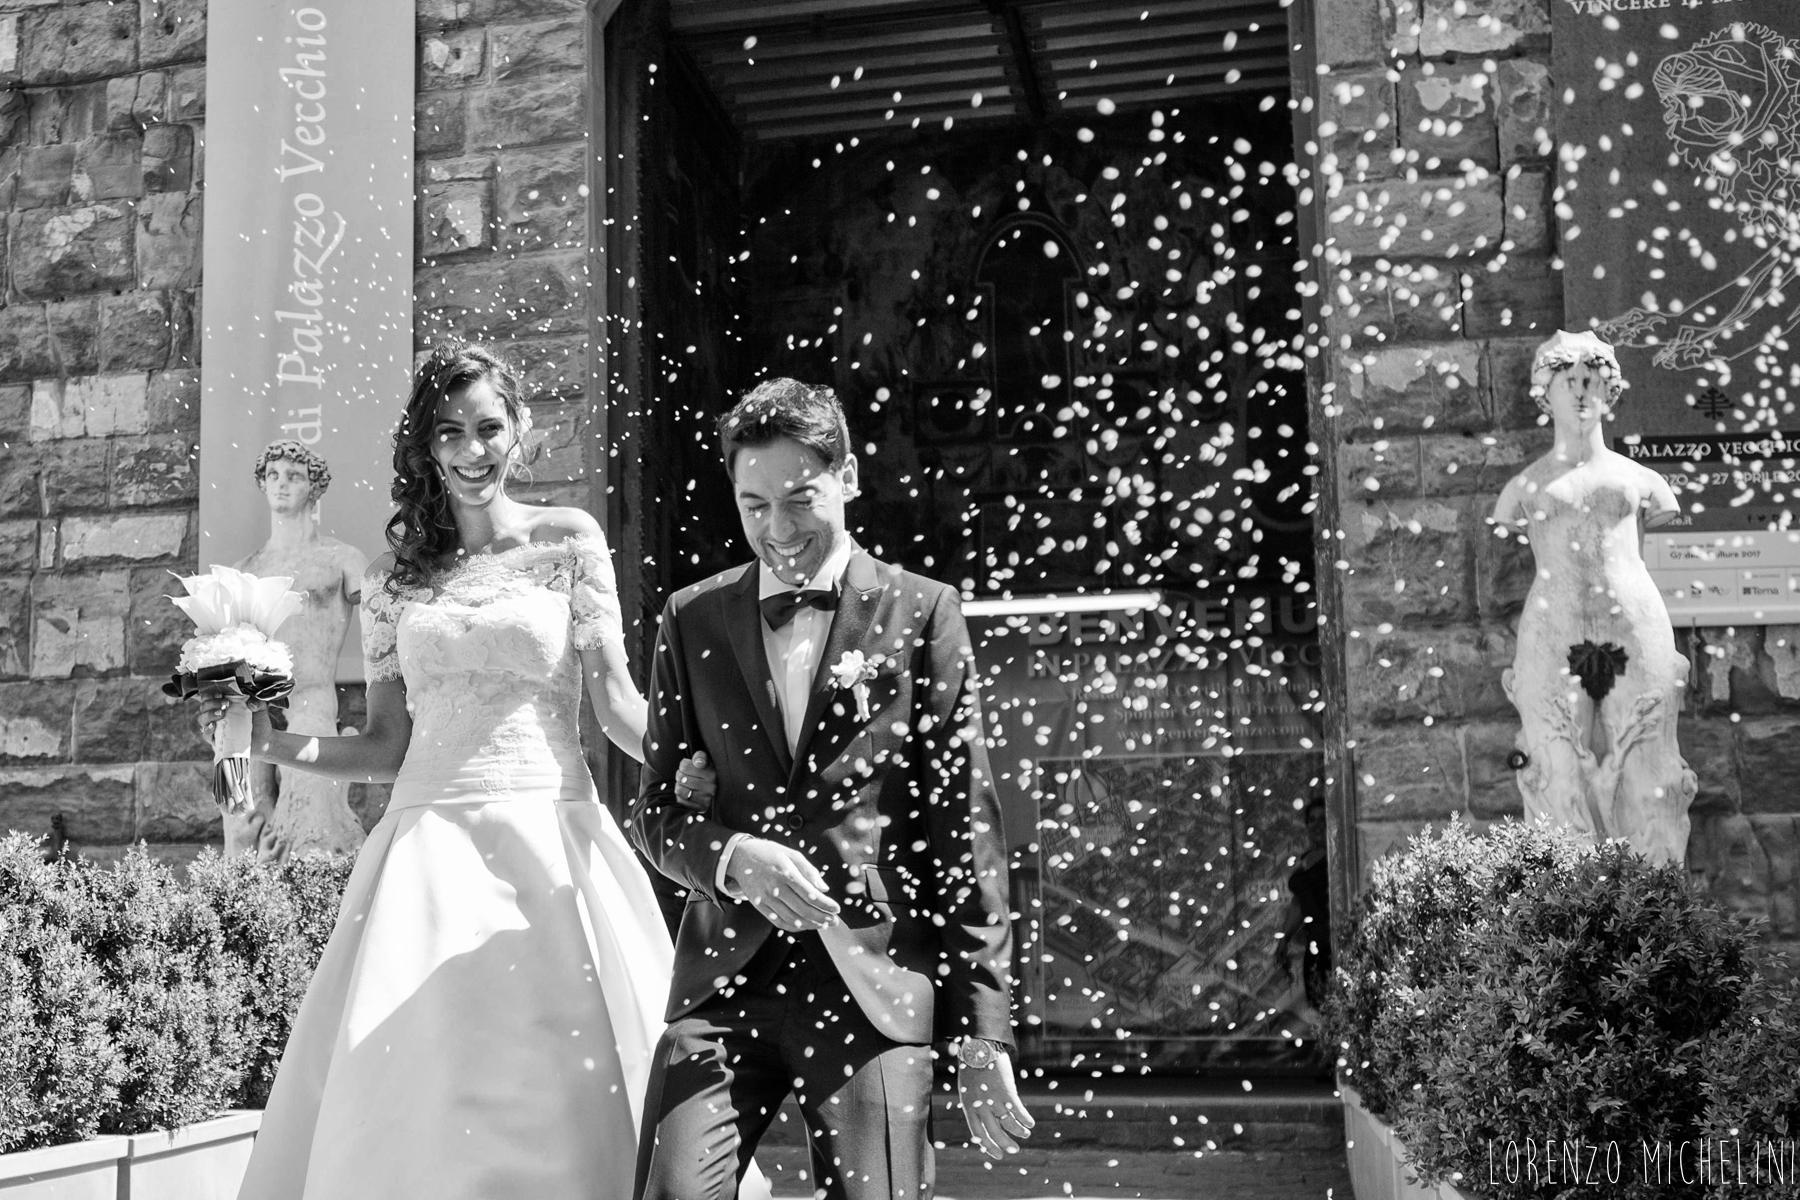 wedding-photographer-reportage-scattidamore-italy-49